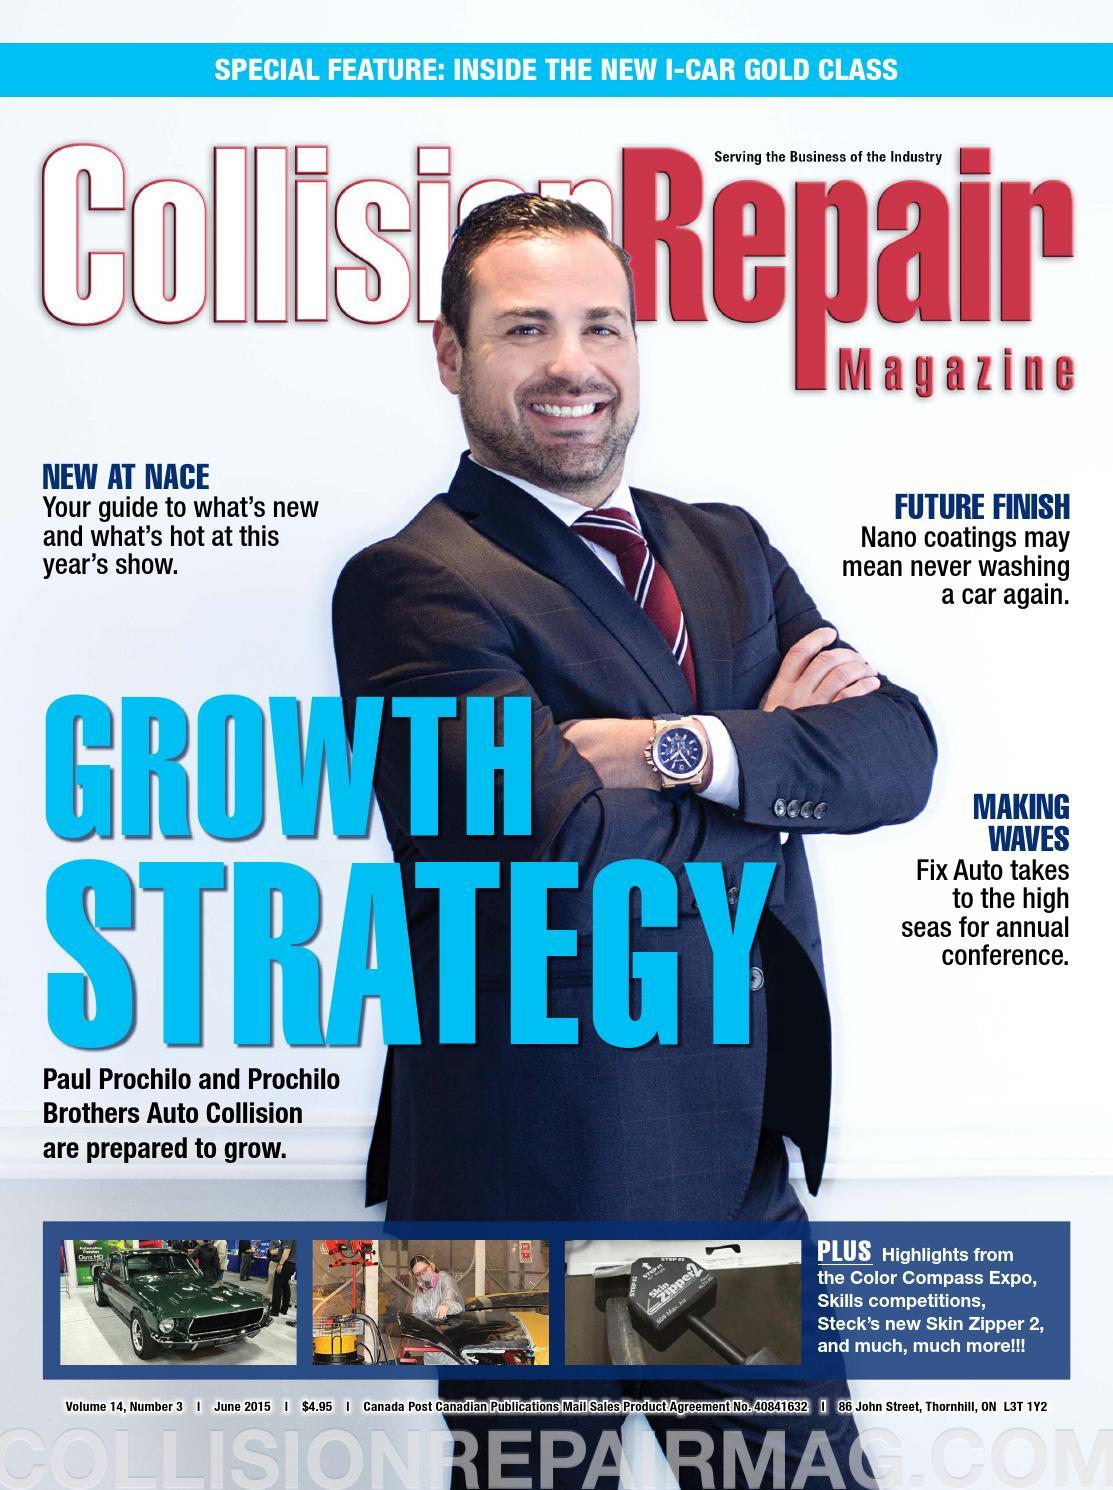 Collision Repair magazine 14#3, June 2015 by Media Matters - issuu